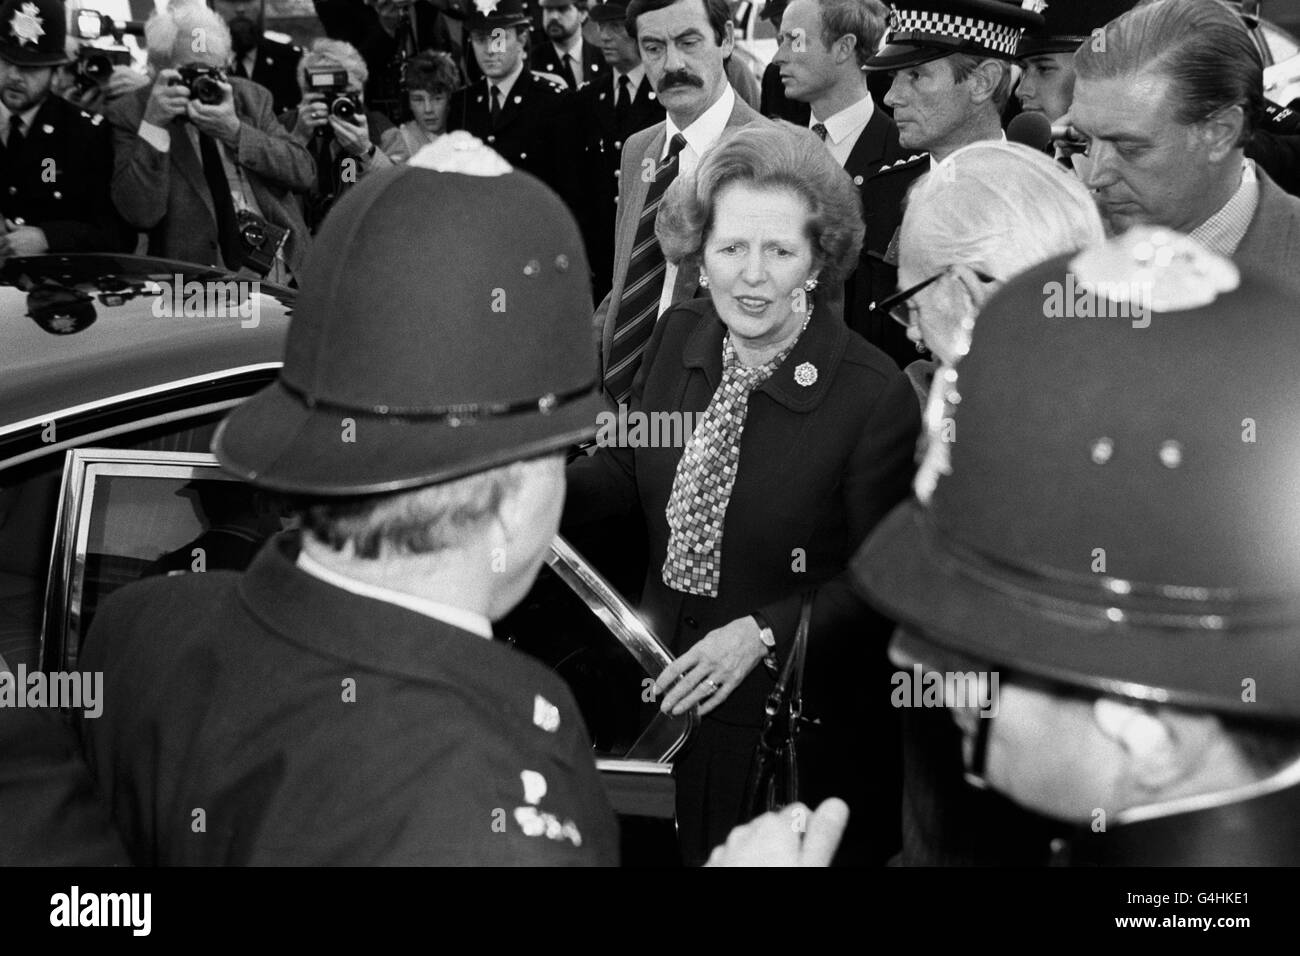 Politics - Brighton Bombing - 1984 - Stock Image